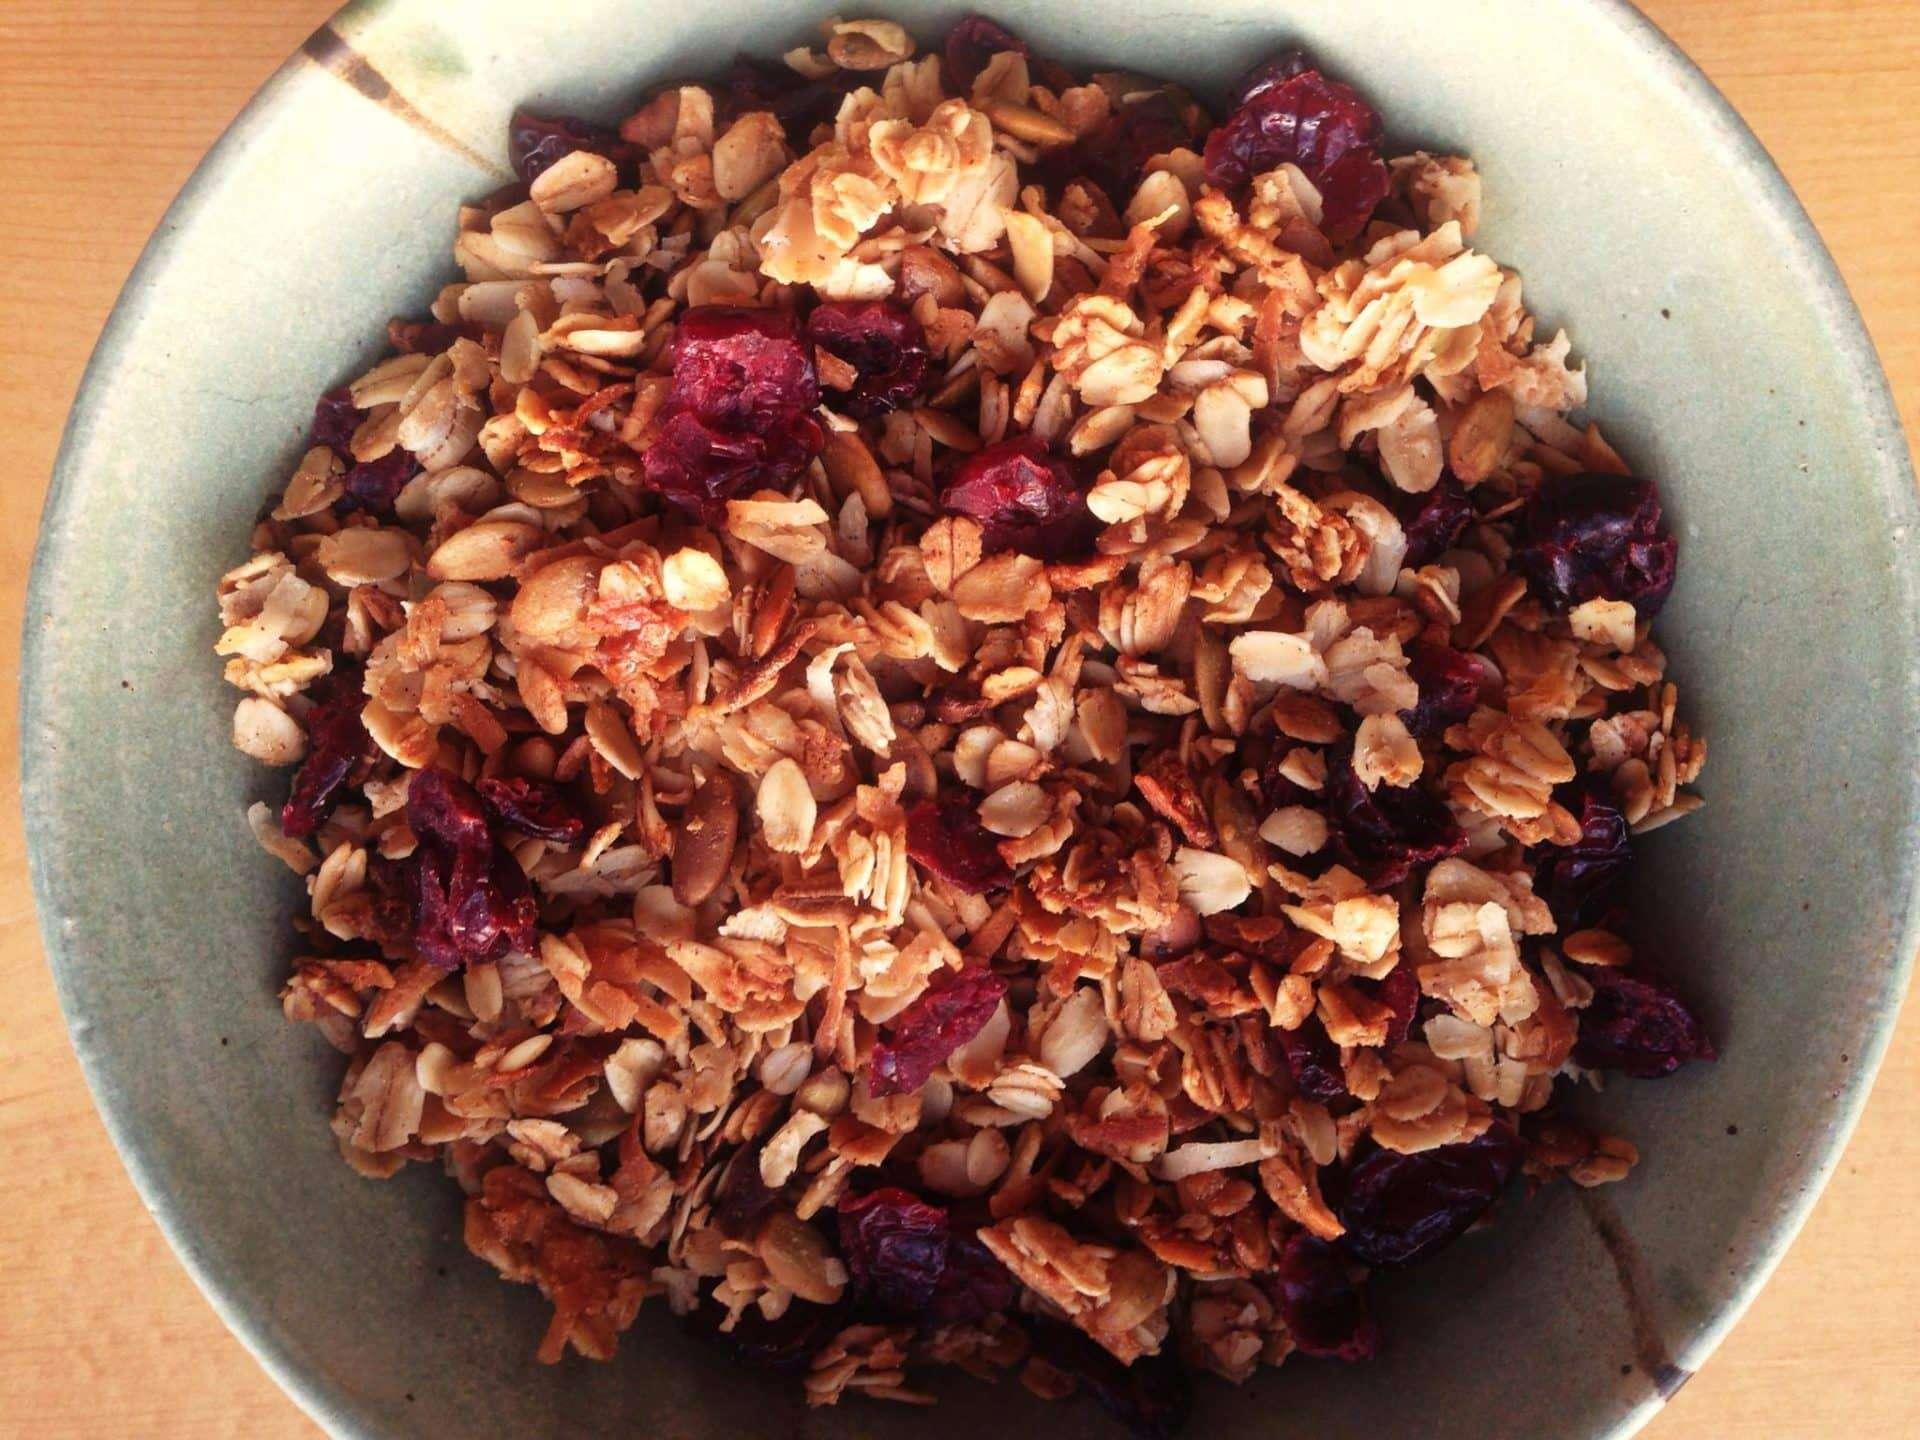 Door County Love – Artisian Granola